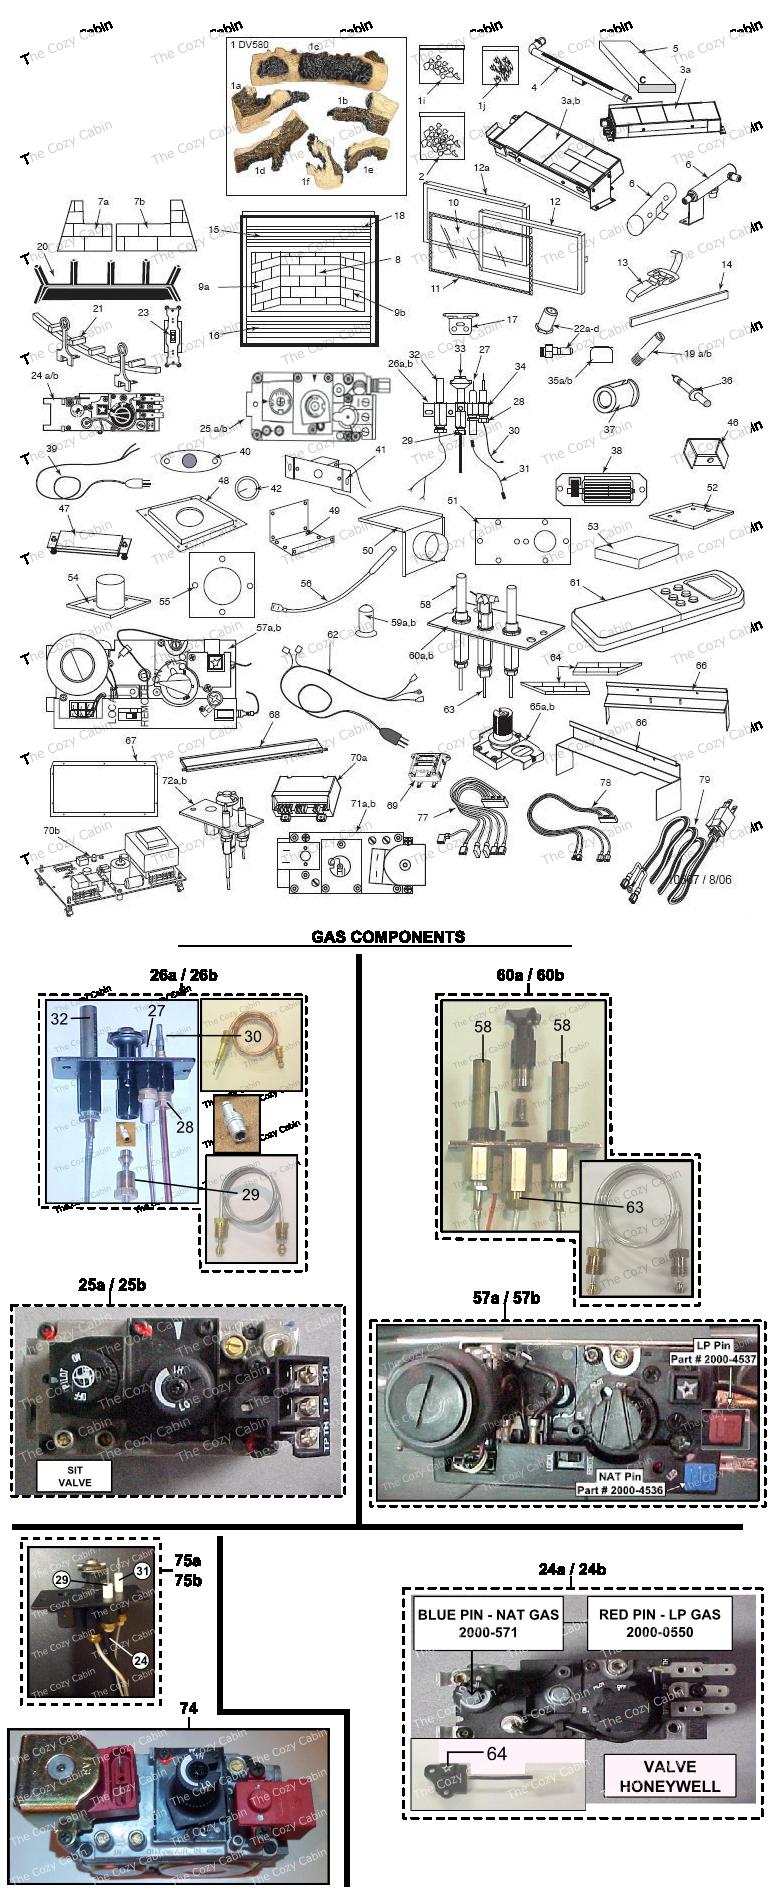 dv580 gas fireplace vermontcastings parts online parts store